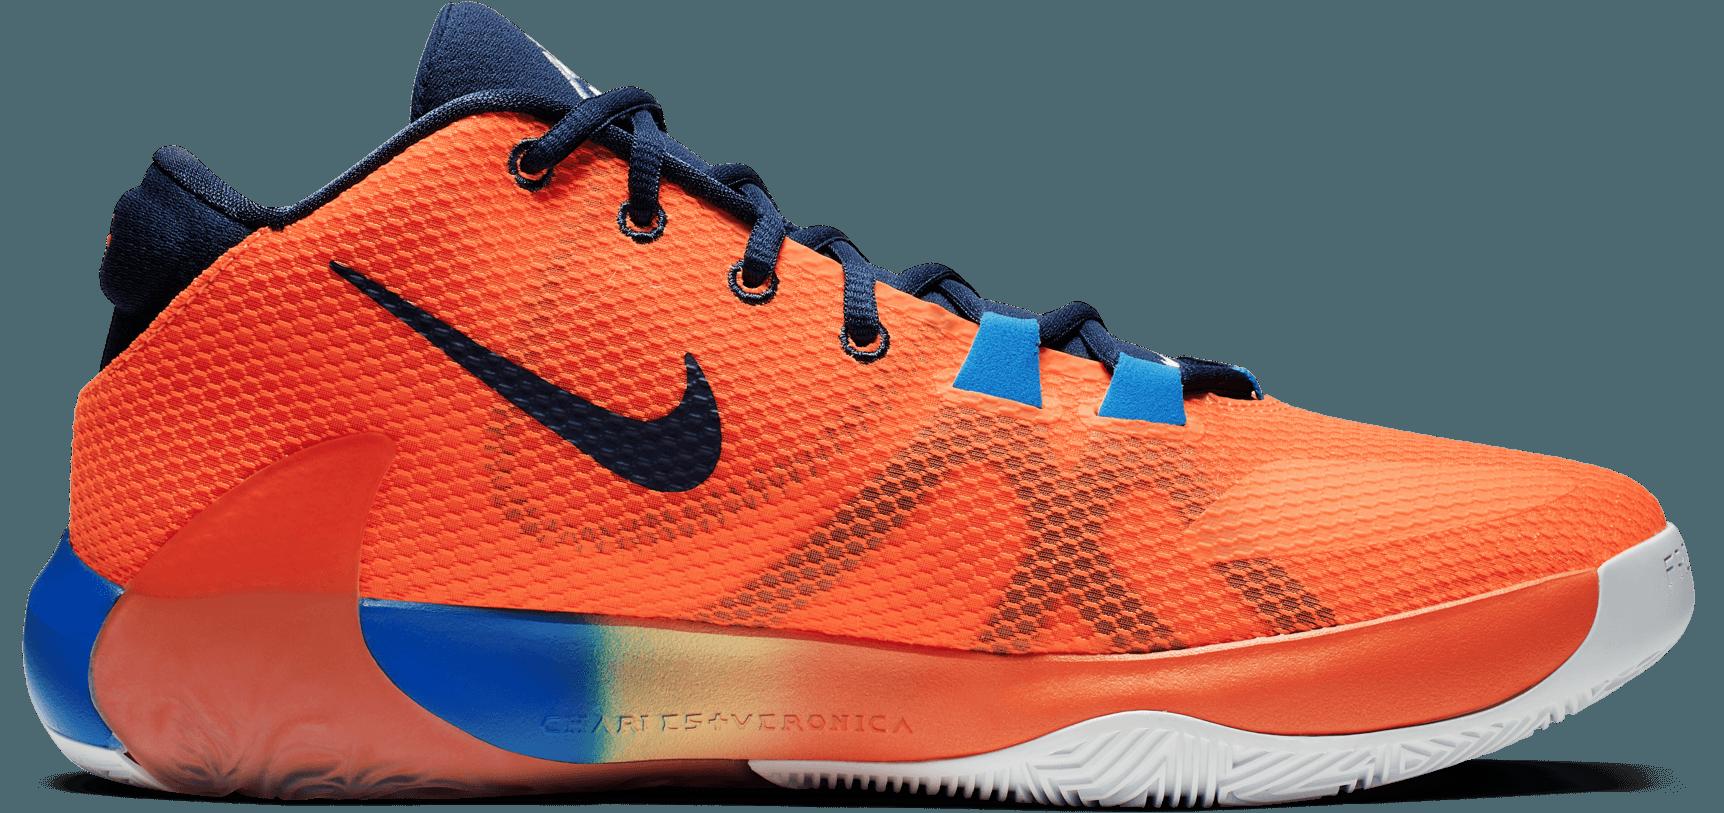 Nike Zoom Freak 1 Review Deals 40 Pics Of 13 Colorways